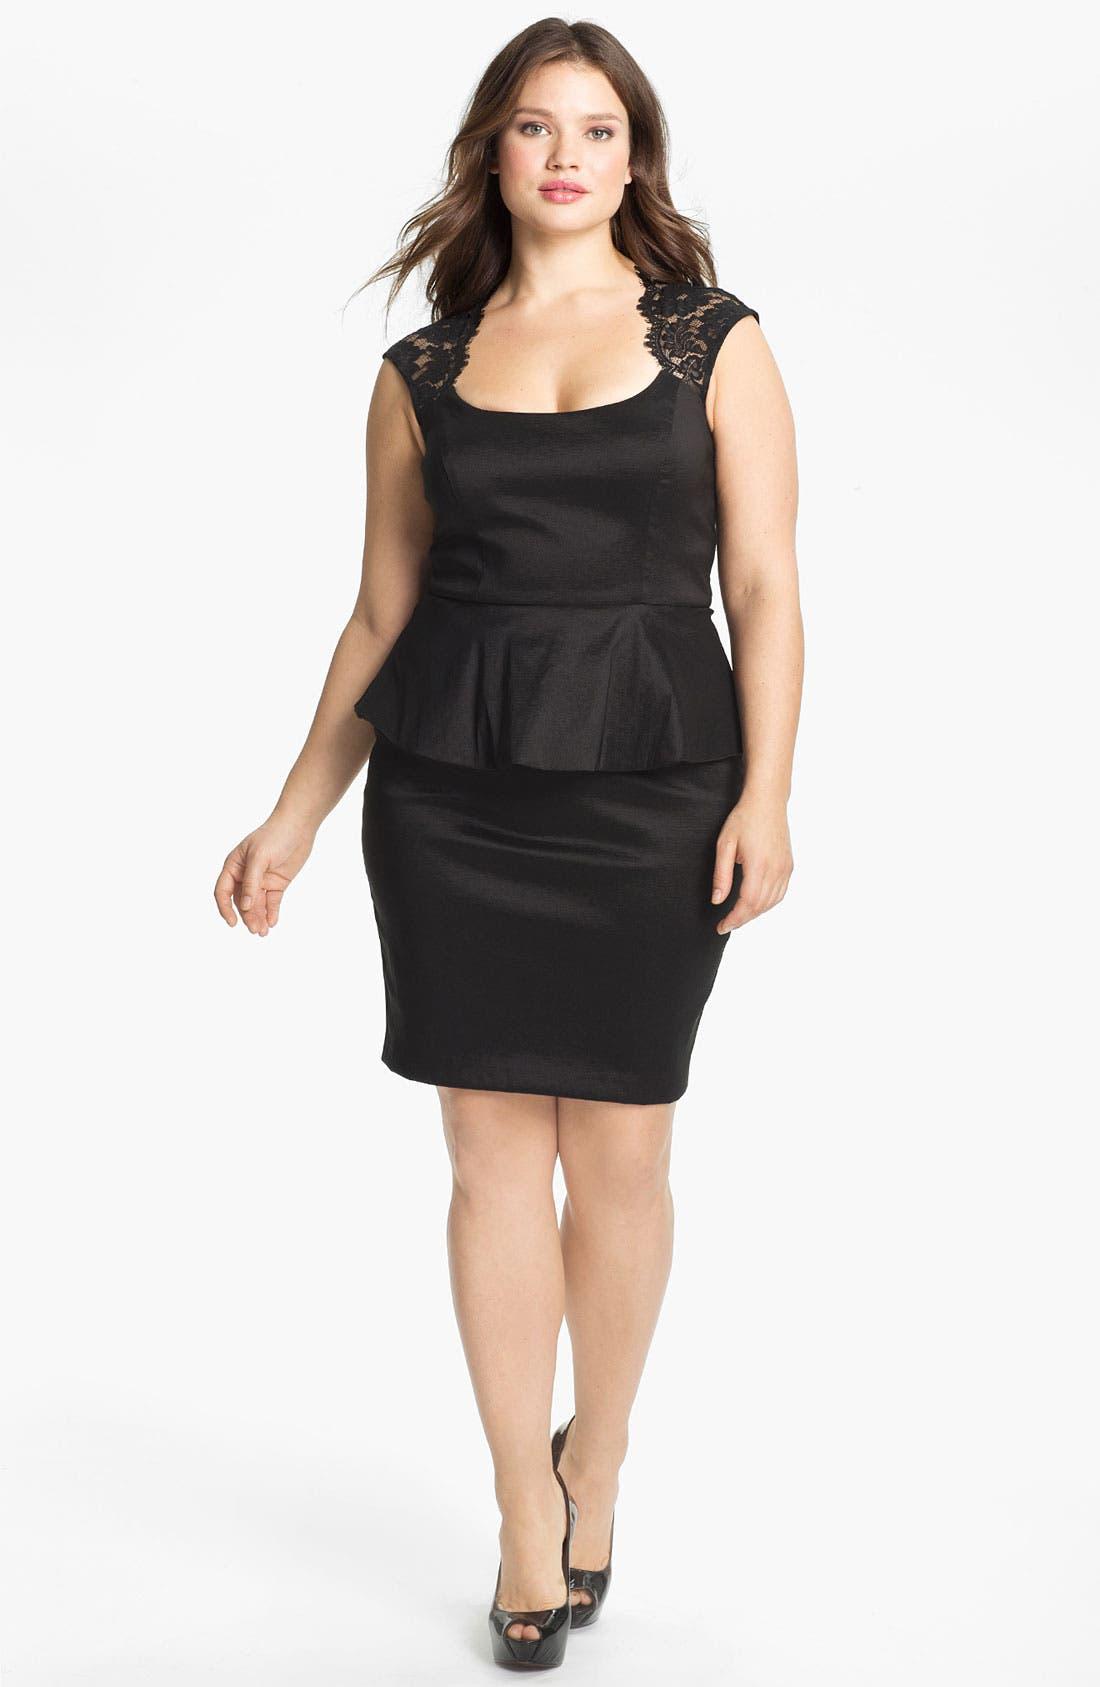 Alternate Image 1 Selected - Xscape Lace Detail Peplum Dress (Plus Size)